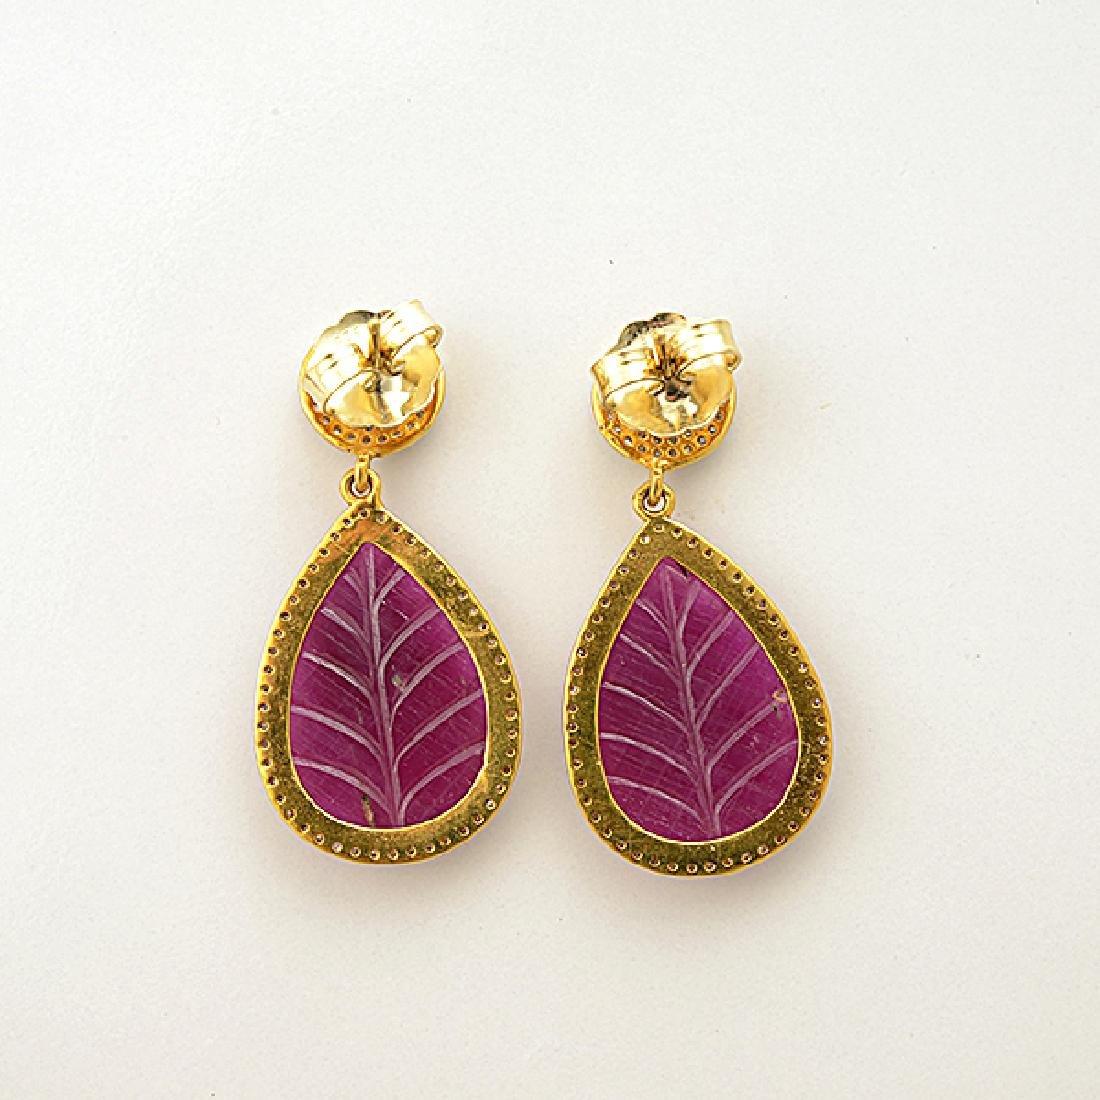 Pair of Ruby, Diamond, 14k Yellow Gold Earrings. - 4